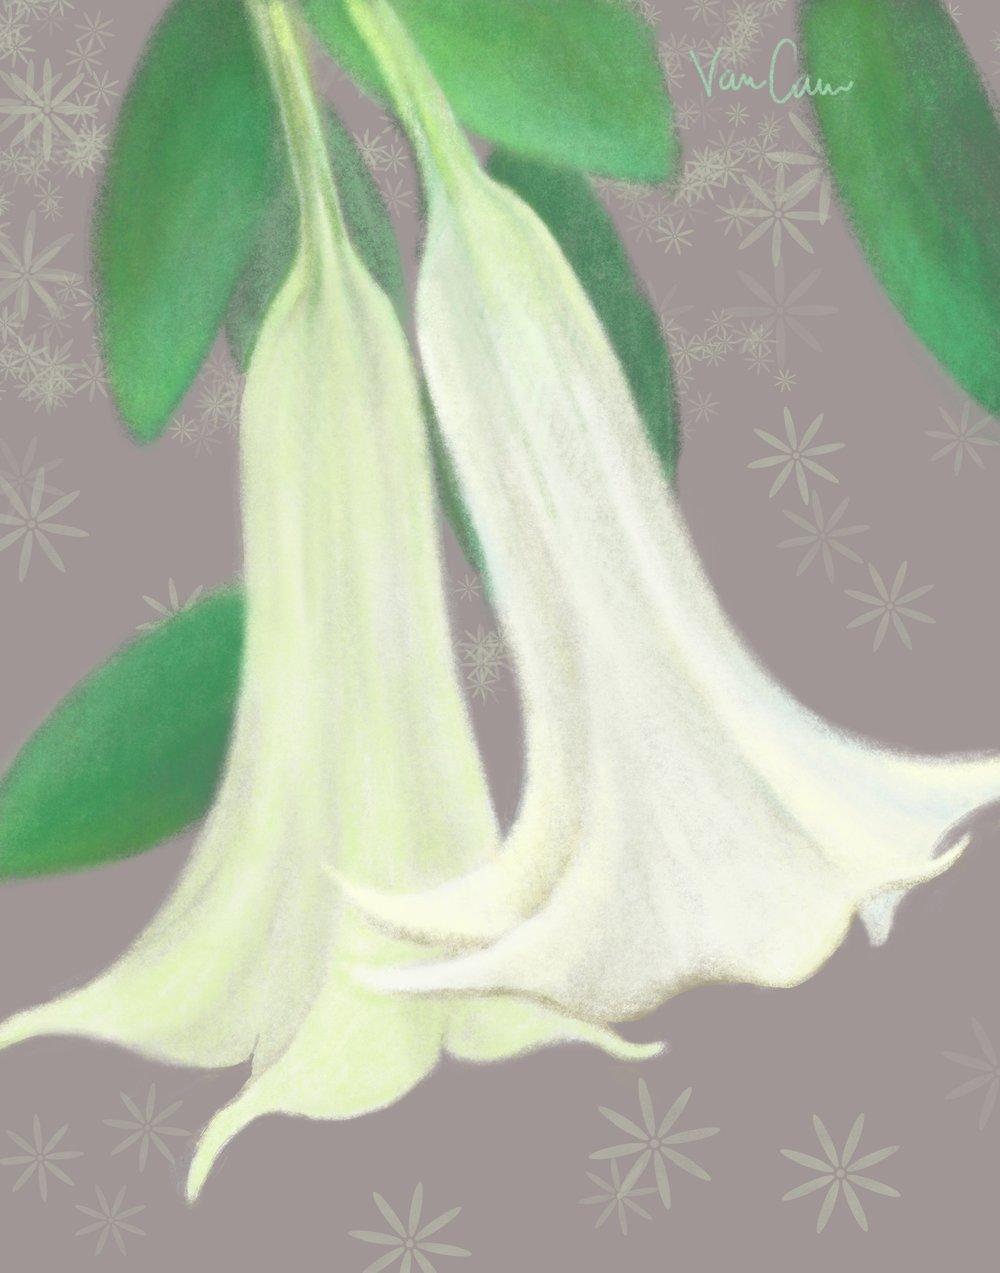 White Trumpet Tree Flowers Digital Painting